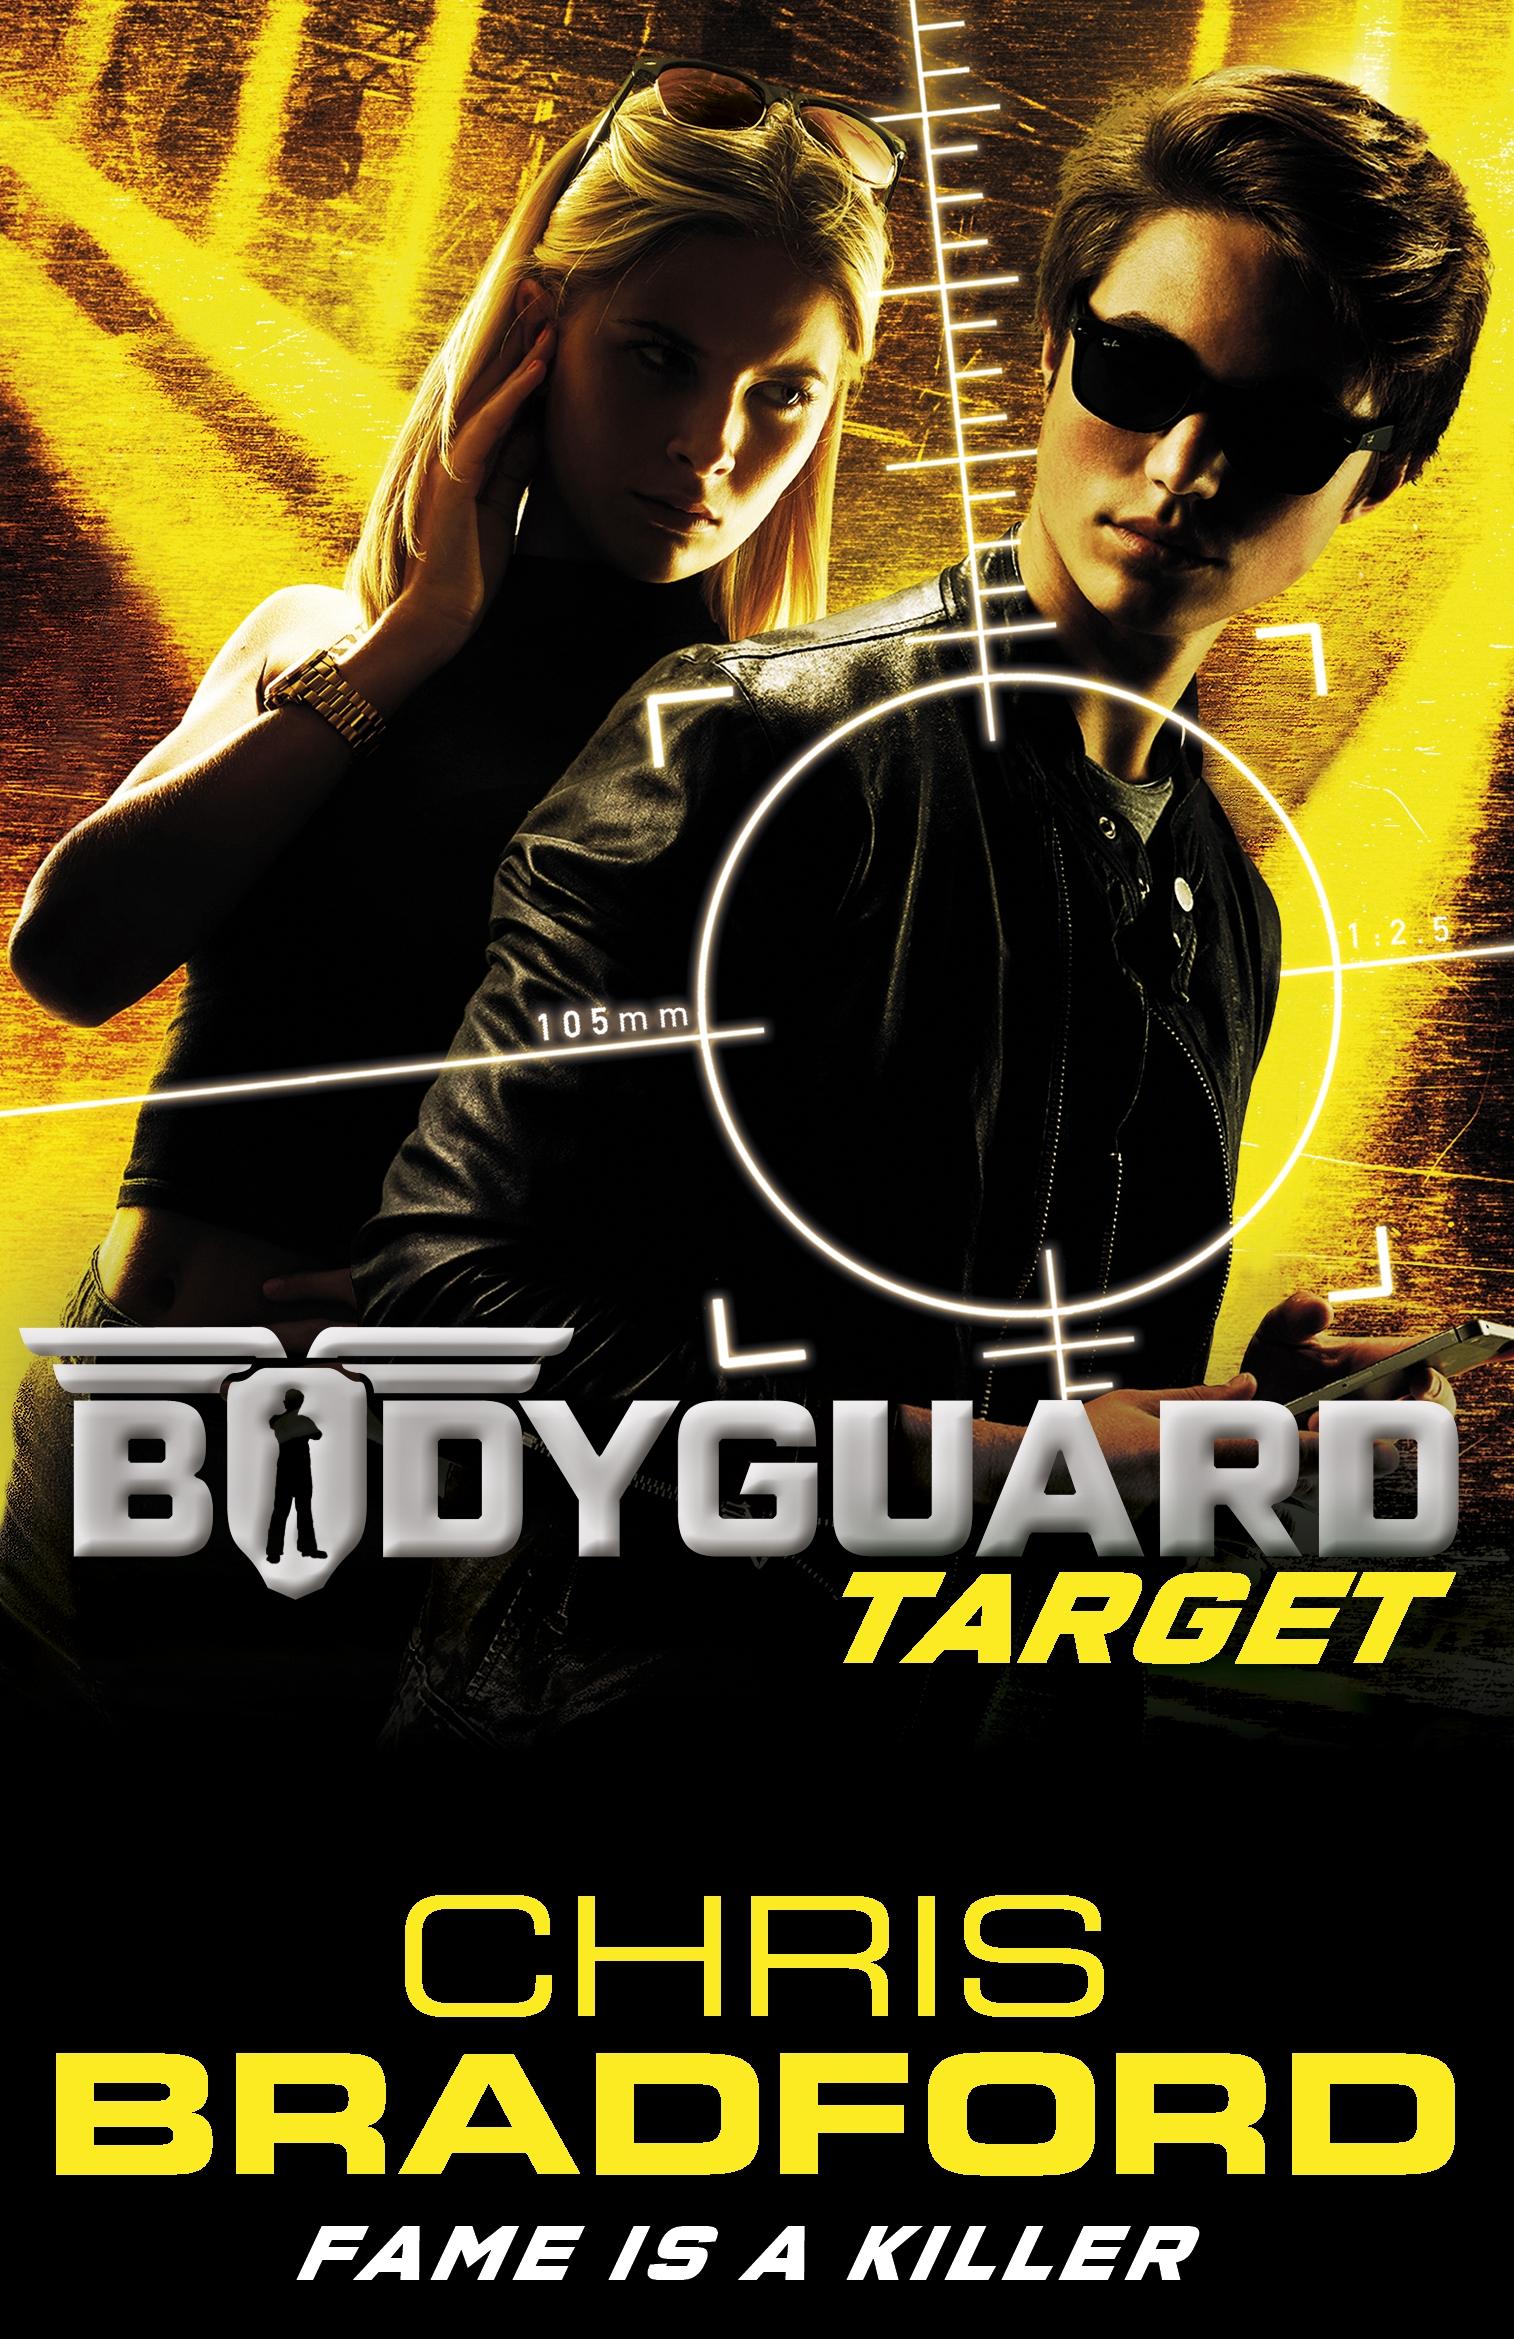 Book Covering Contact Target : Bodyguard target by bradford chris penguin random